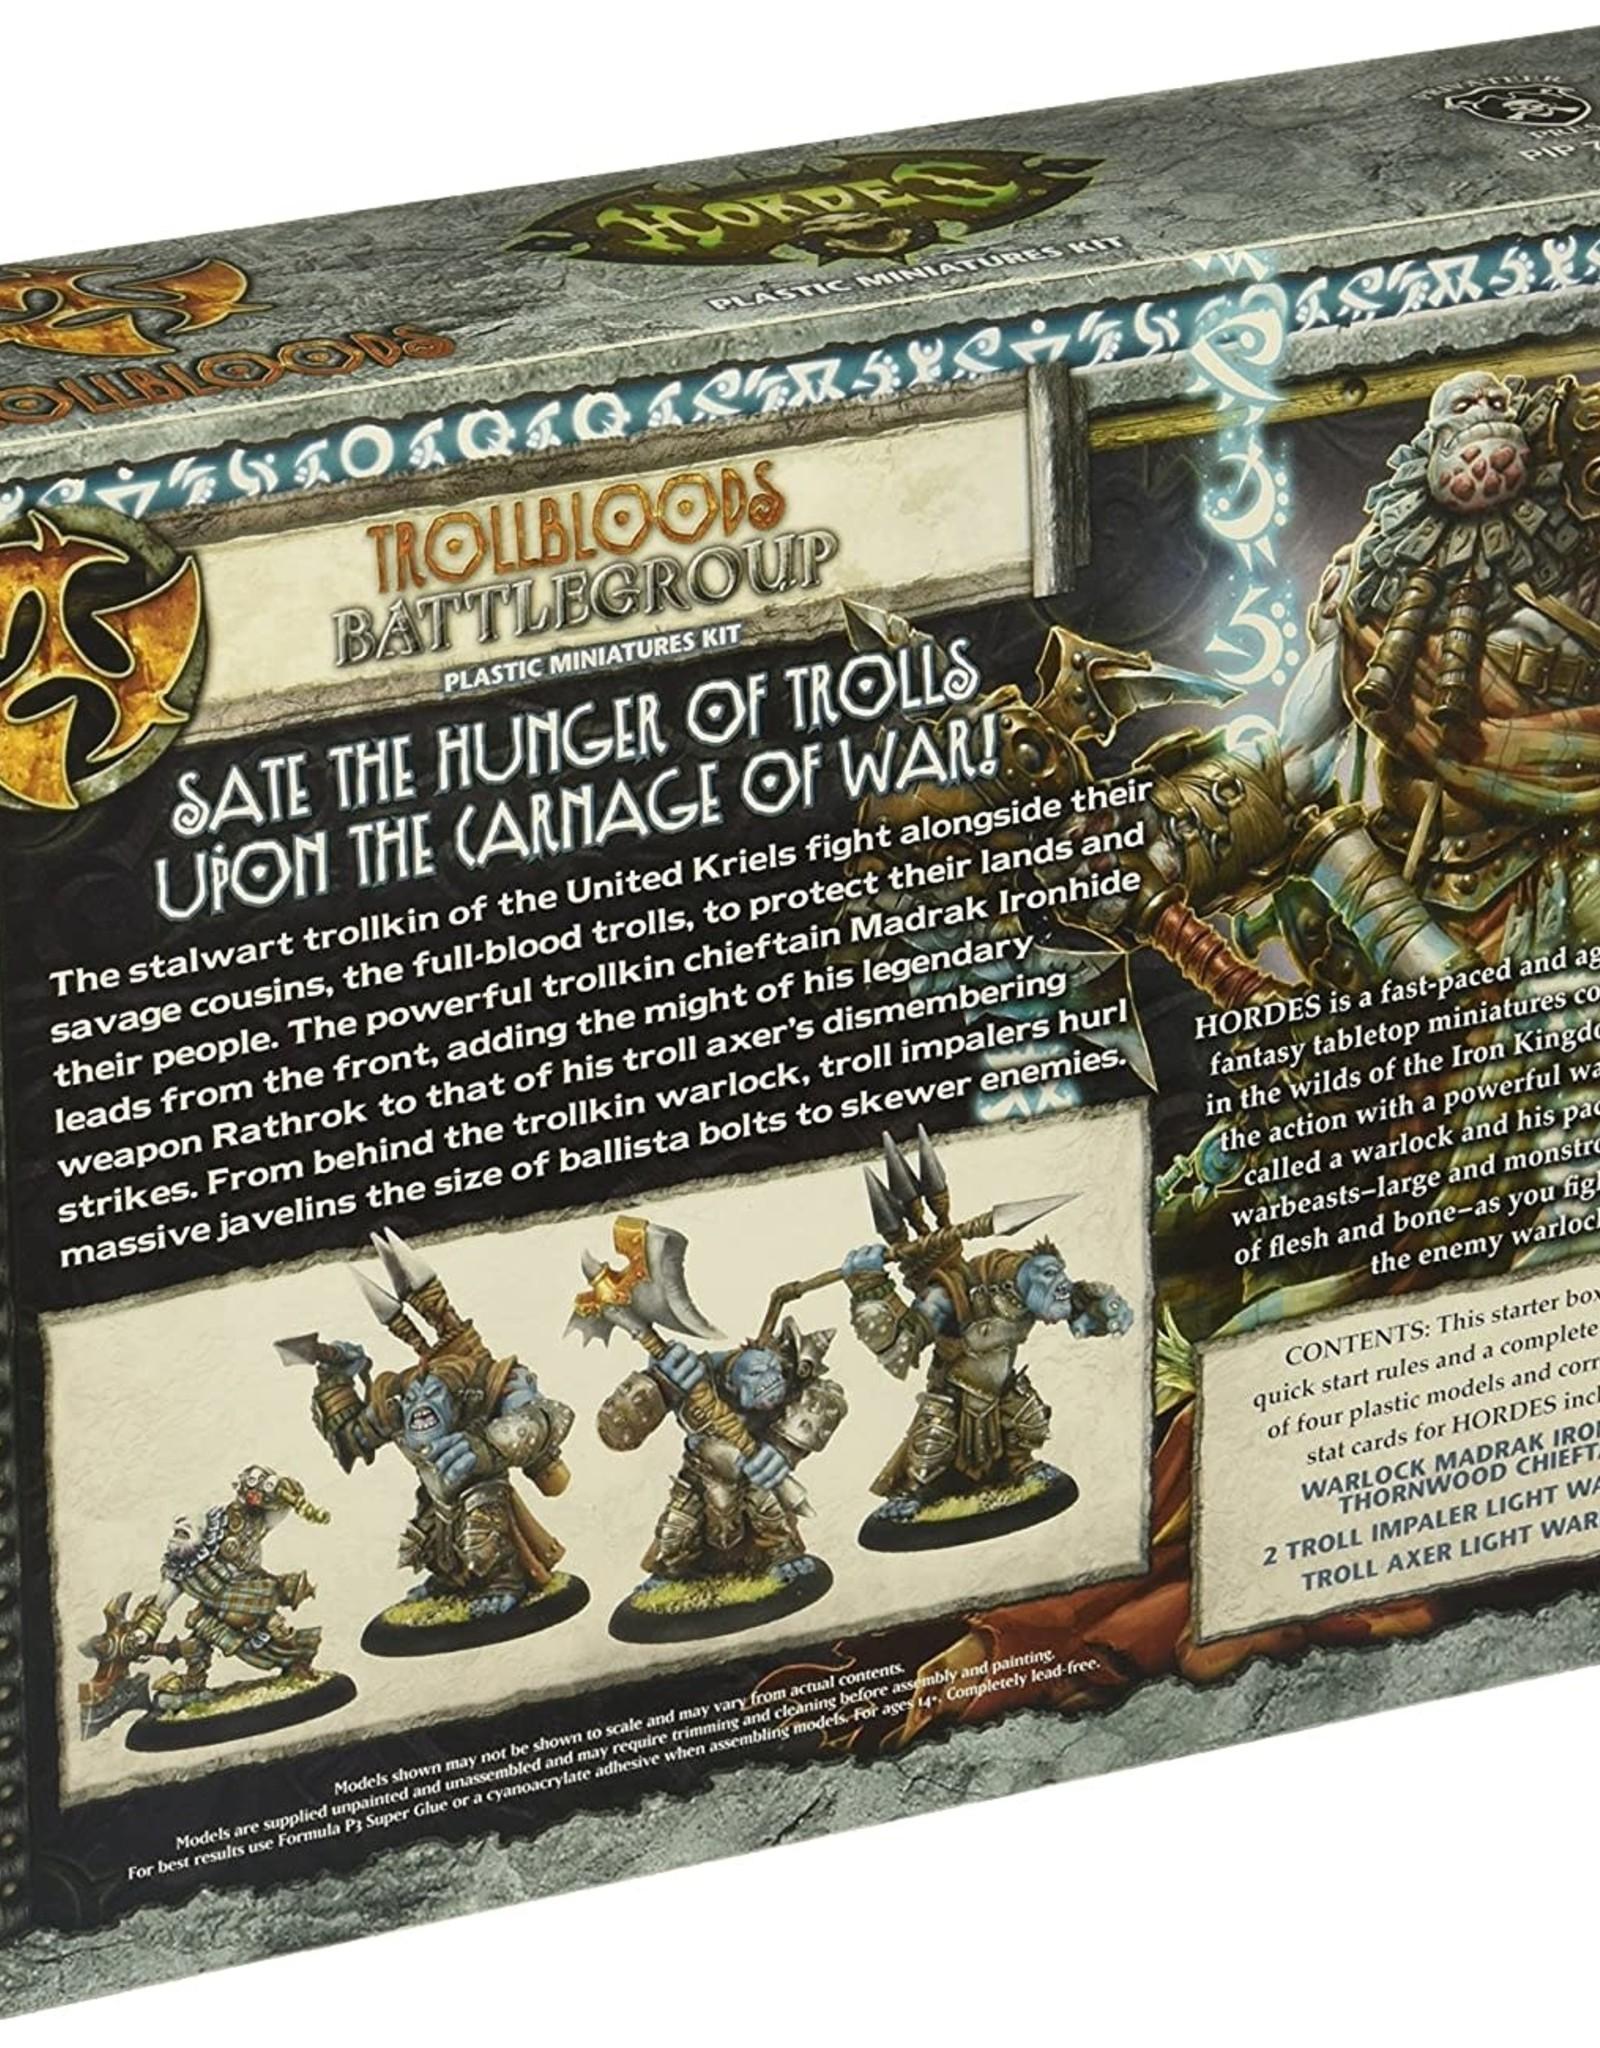 Hordes Trollbloods - Battlegroup